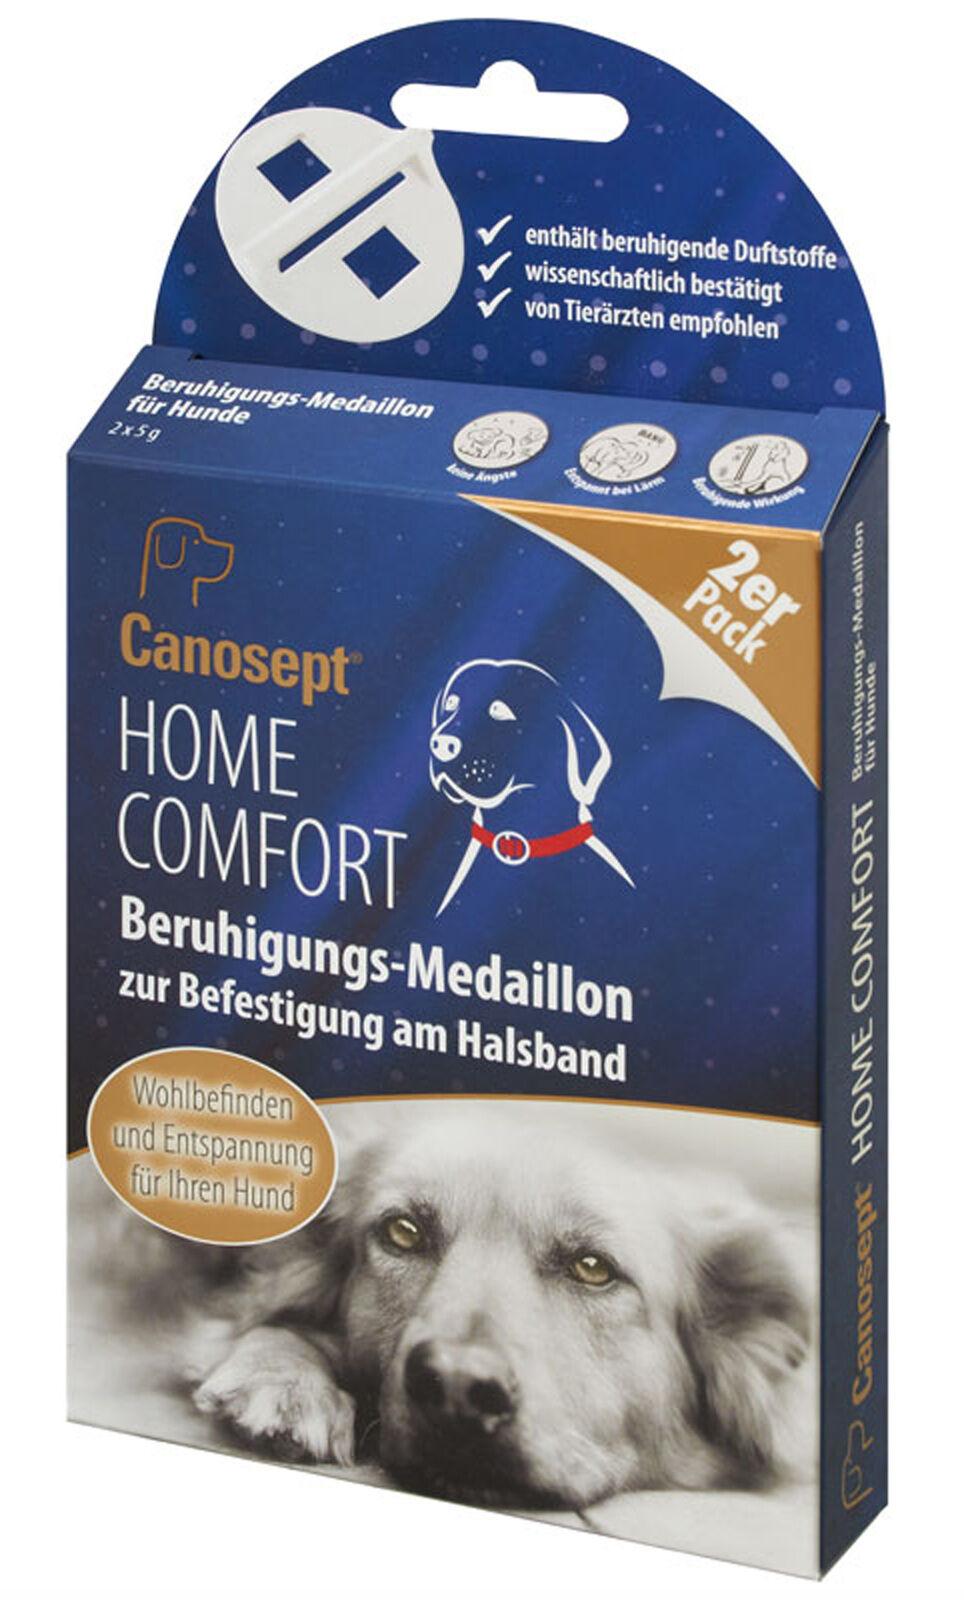 Canosept Home Comfort Beruhigungs-Medaillon (10,00€/1Stk)